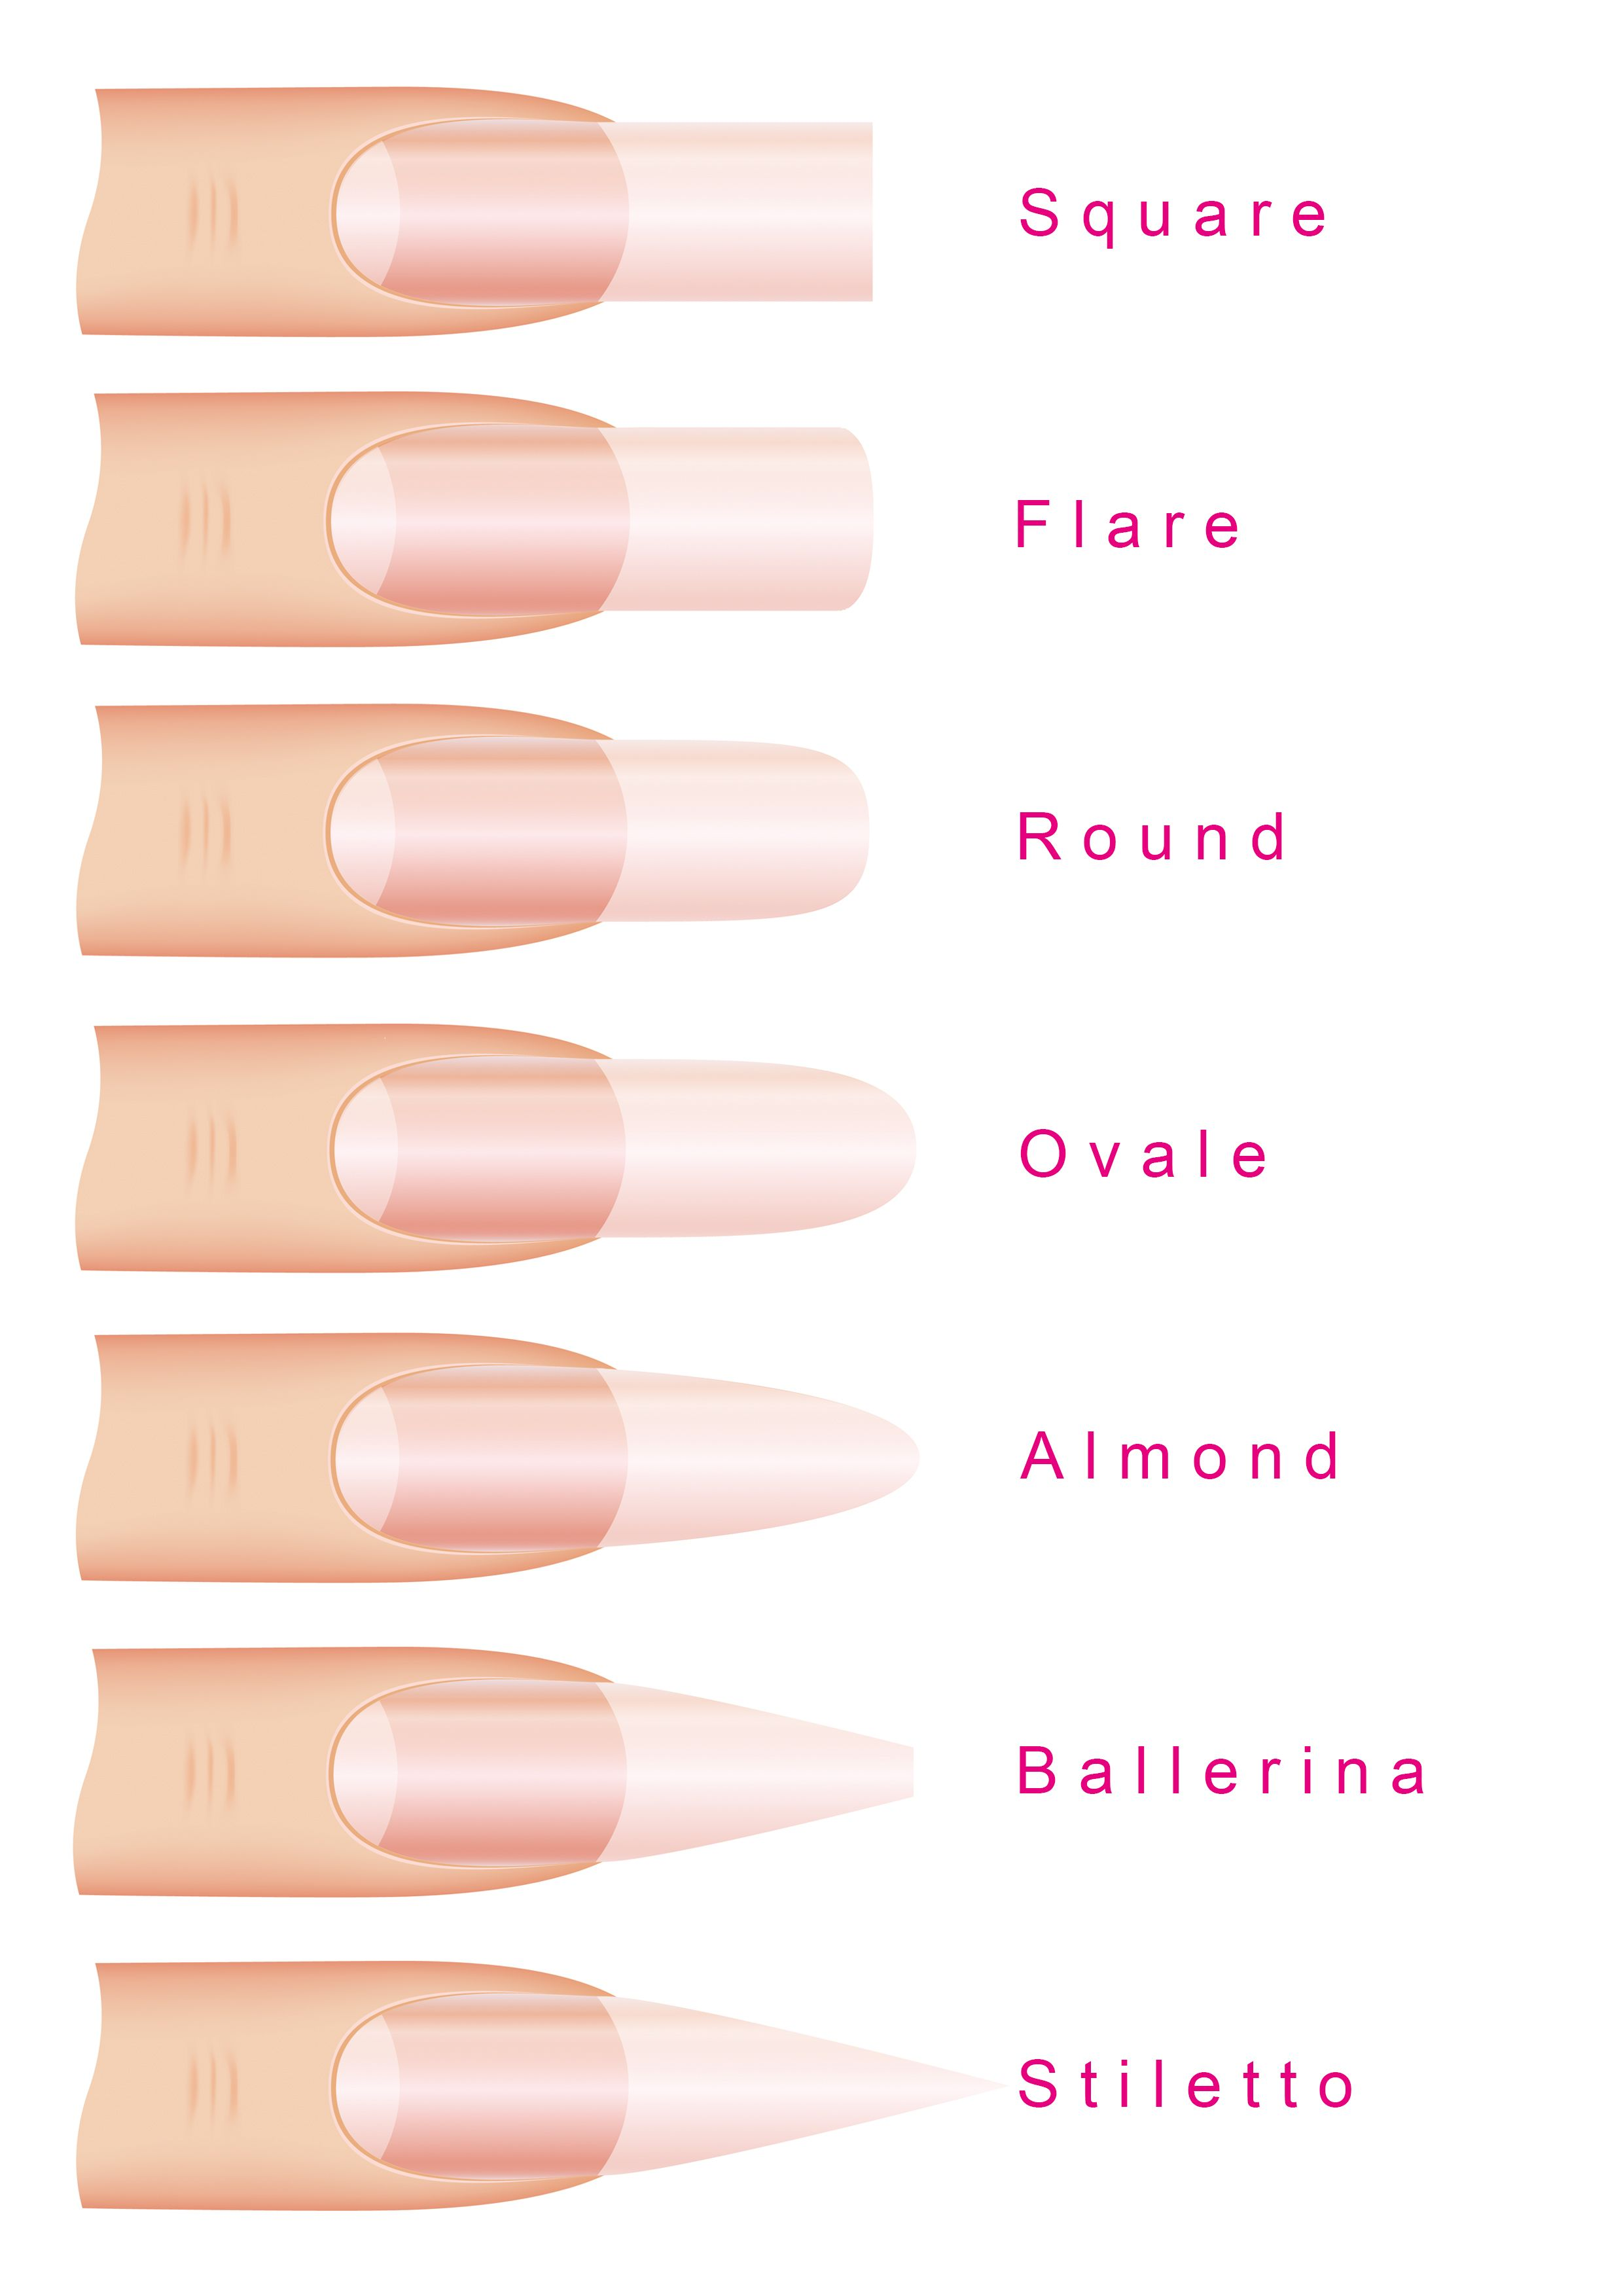 Nagelformen - Amanda Nails & Beauty GmbH | Nageldesign | Pinterest ...